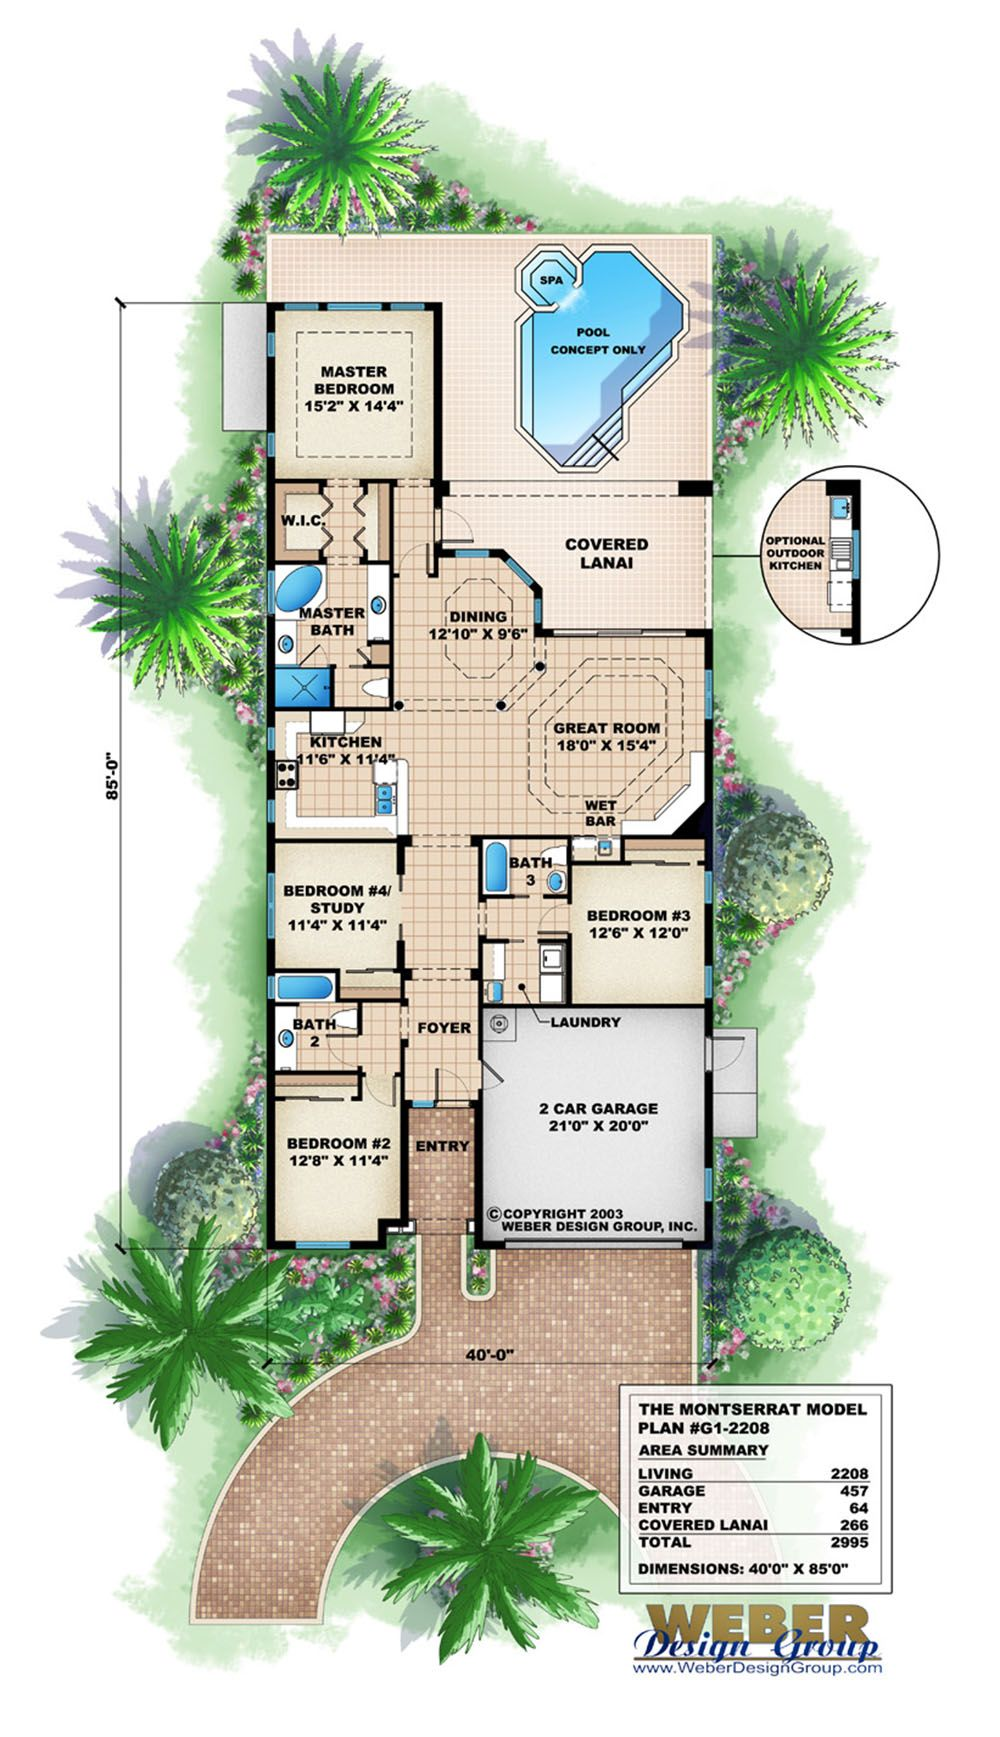 Mediterranean House Plan Waterfront Golf Course Bungalow Home Plan Narrow House Plans Mediterranean House Plans Mediterranean Floor Plans